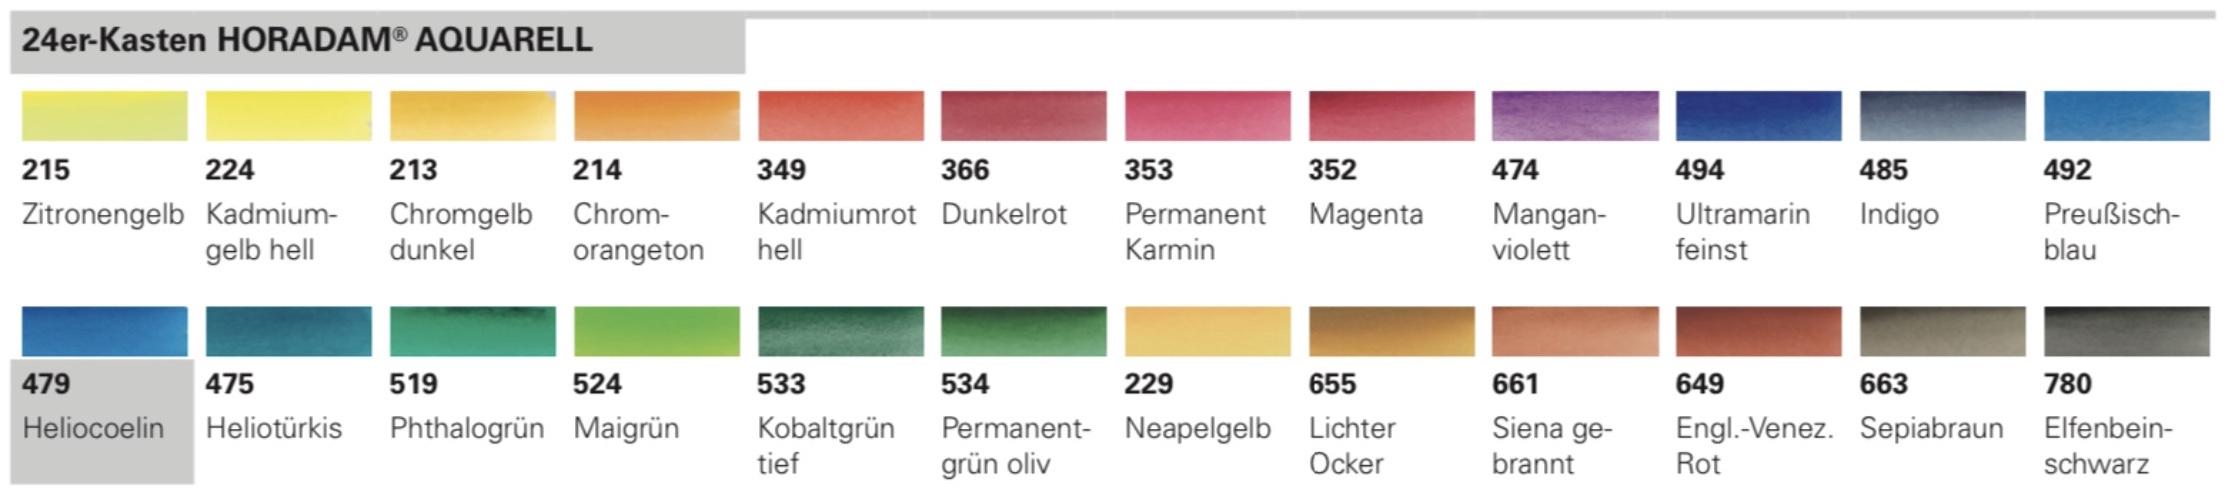 Schmincke-HORADAM-AQUARELL-Farbtoene-24er-Kasten